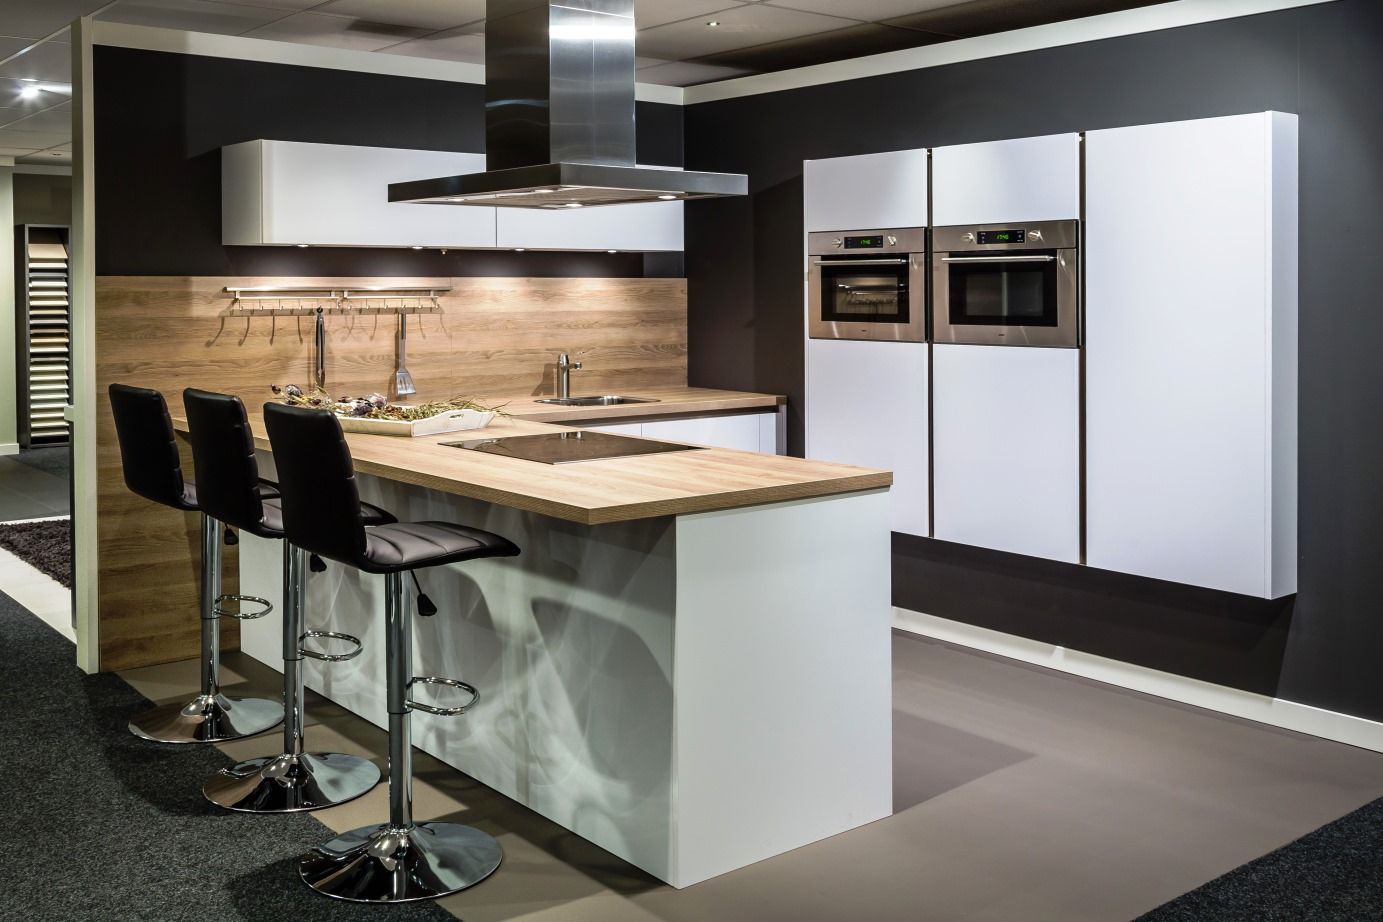 Kembra keukens google zoeken keuken pinterest house and